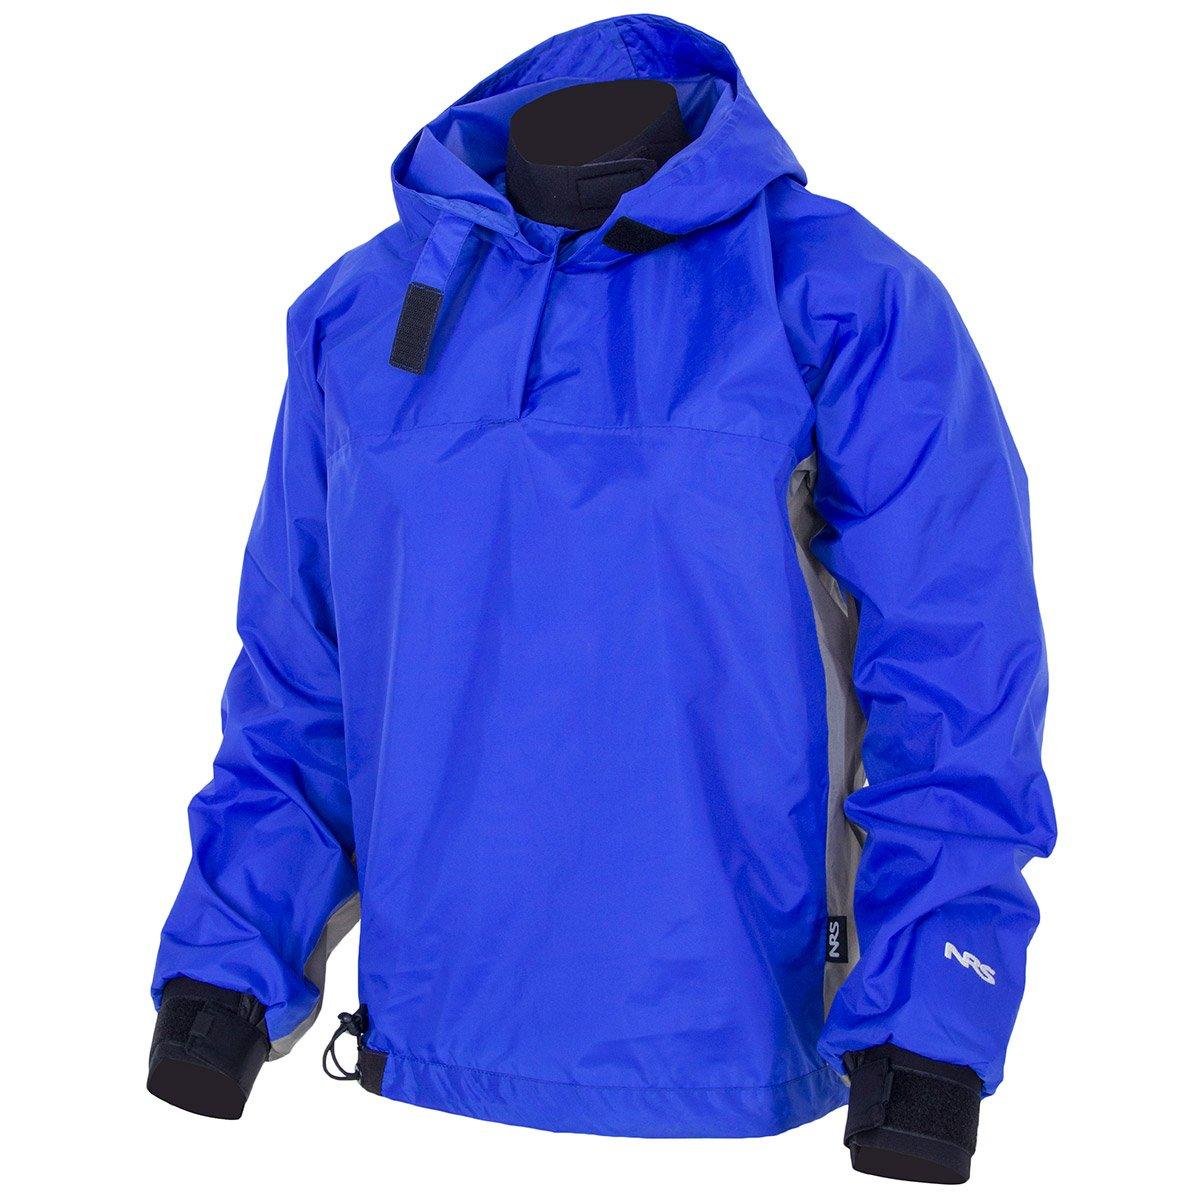 Splash Jacket NRS Rio Hooded